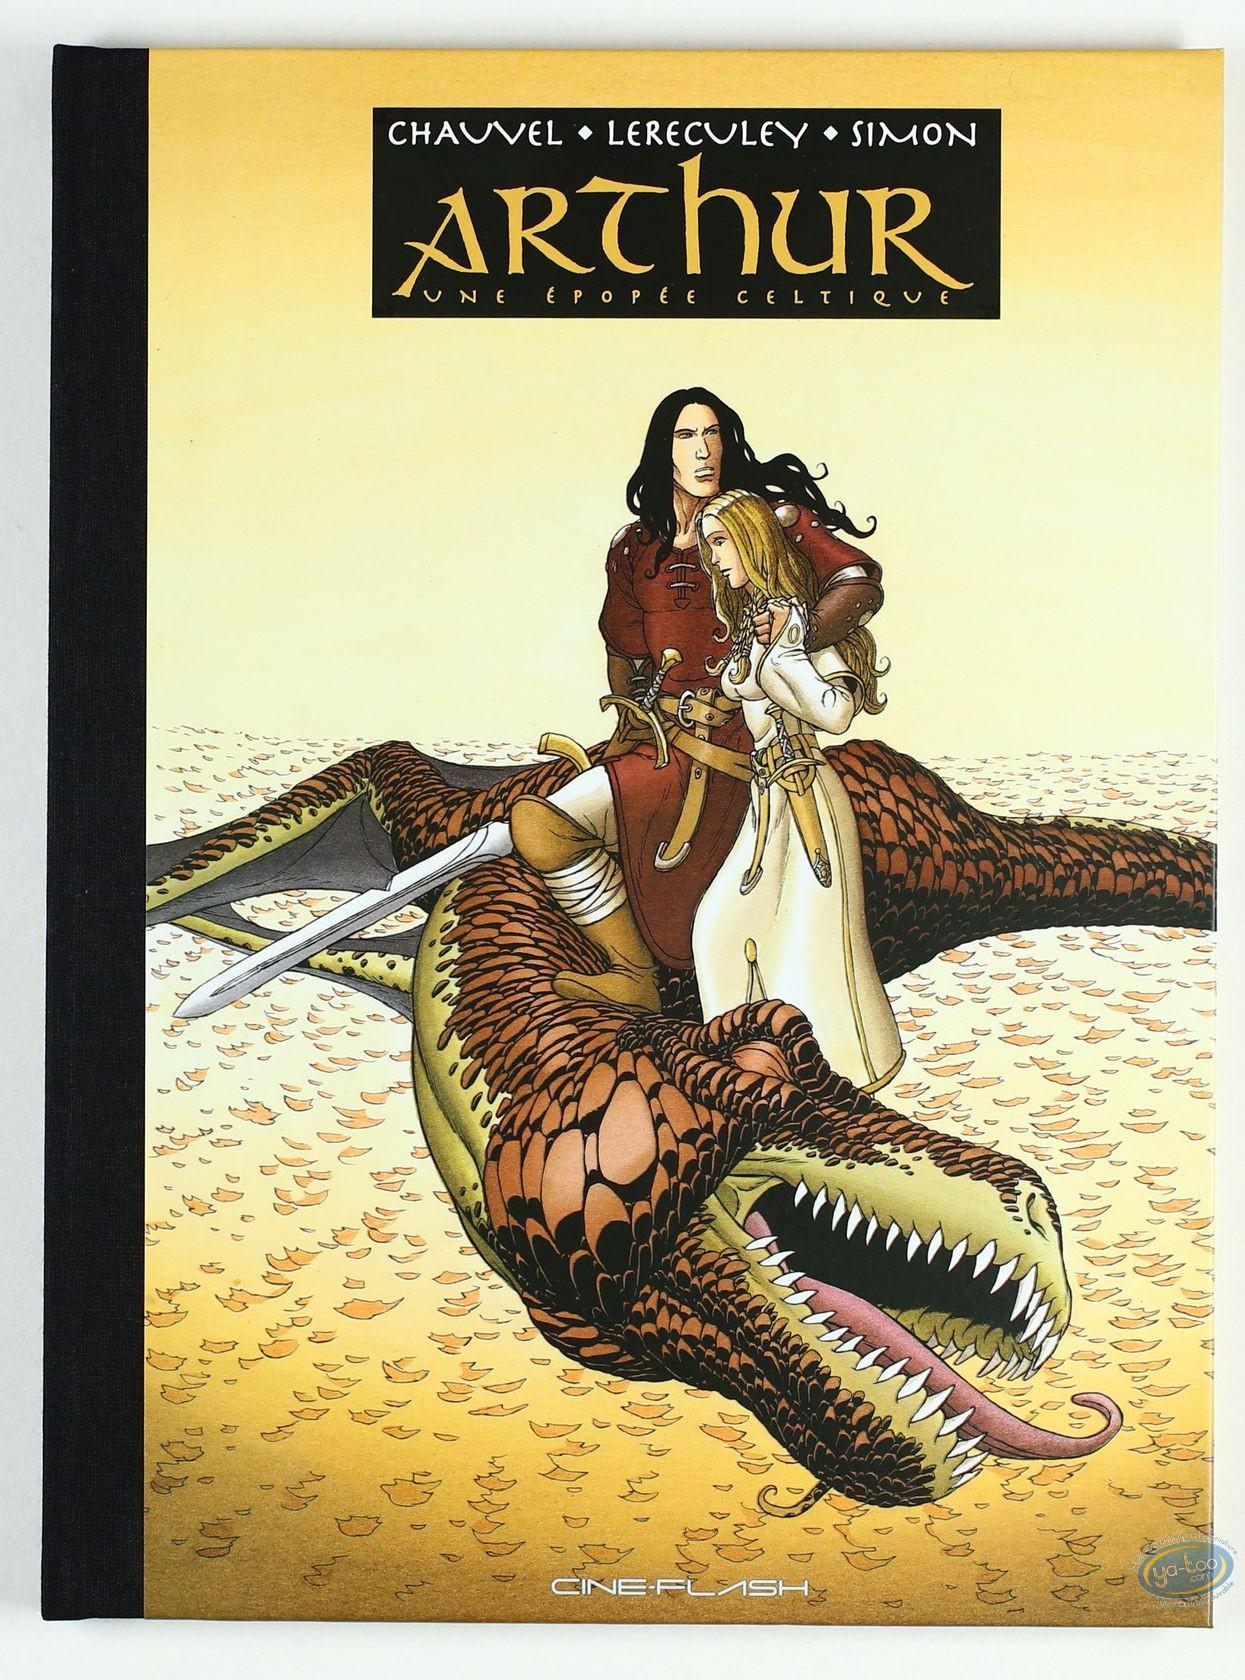 Tirage de tête, Arthur : Drystan et Esyltt